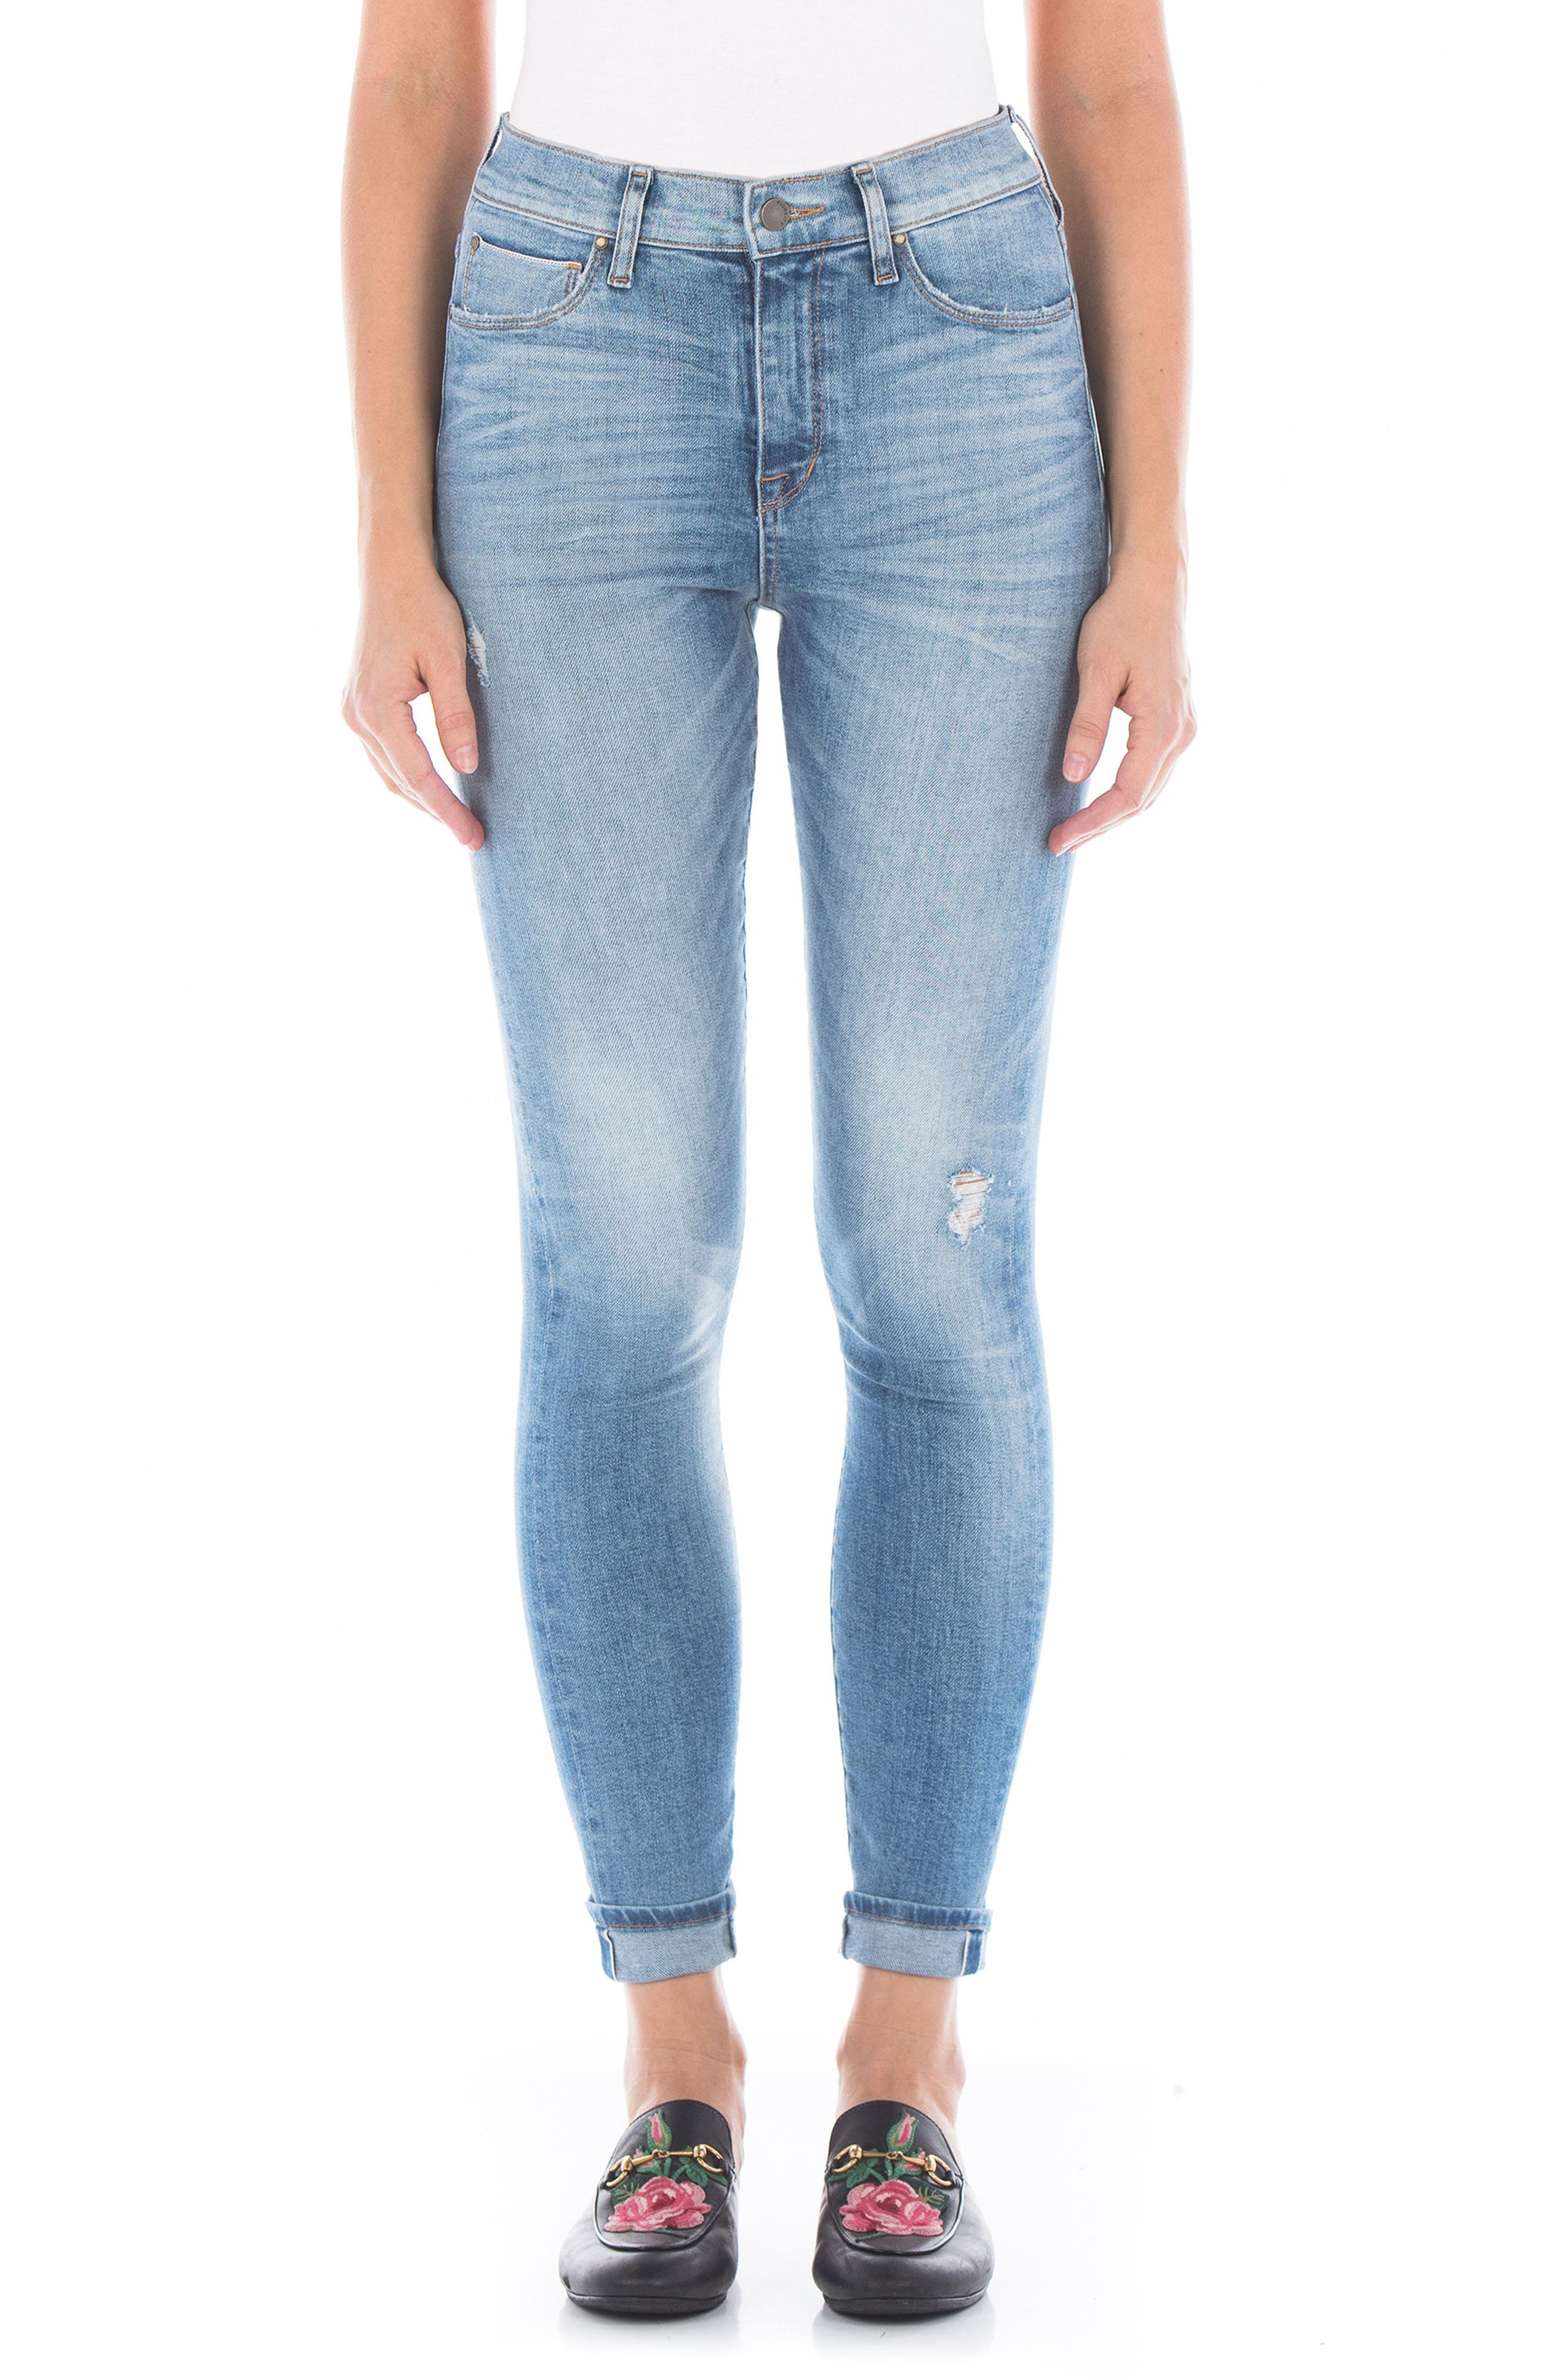 Gwen High Waist Skinny Jeans,                         Main,                         color, 76 SUMMER